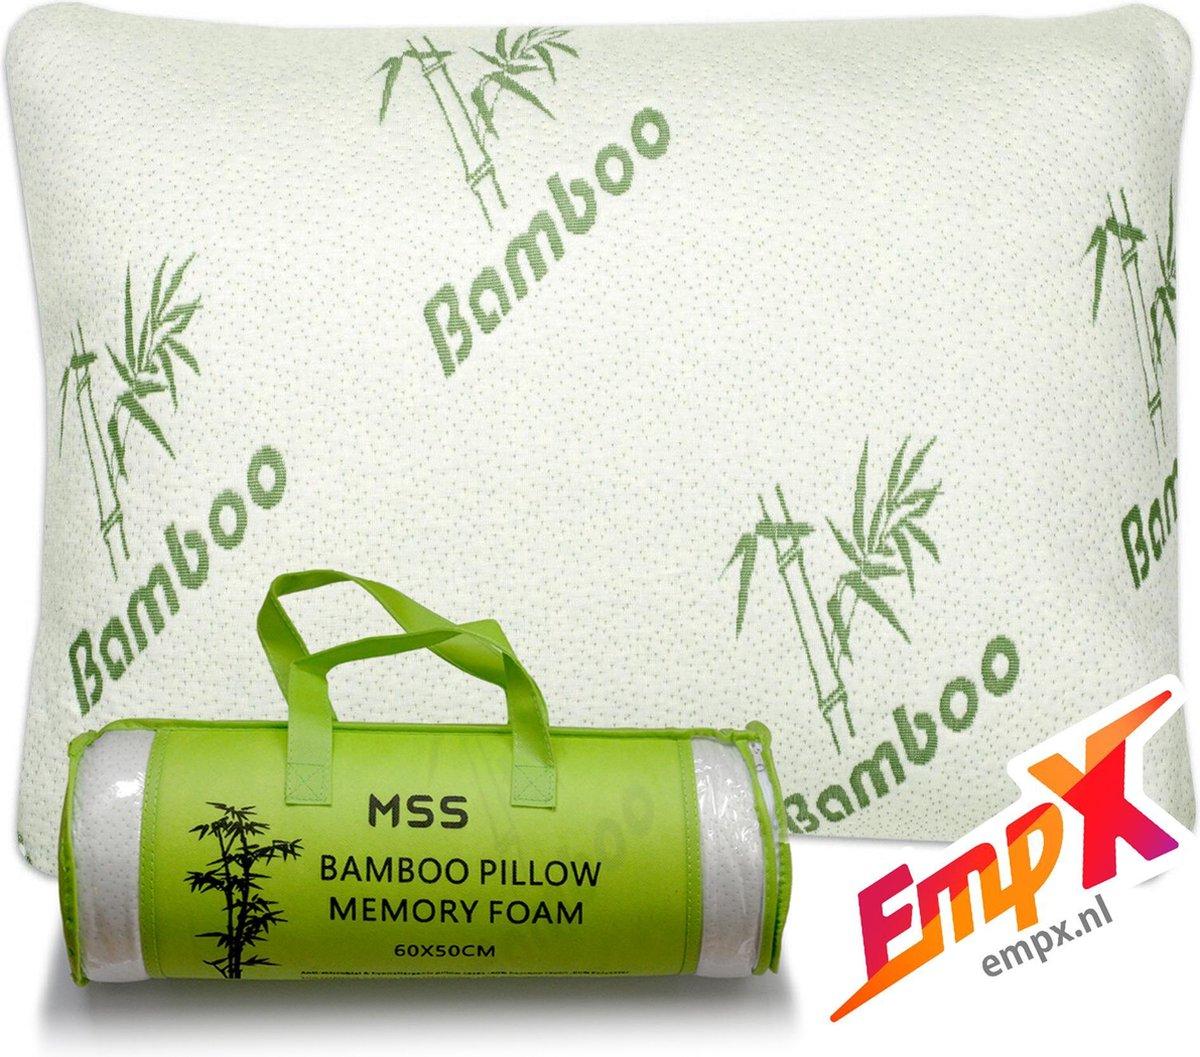 Bamboe kussen - MSS Bamboo Kussen - Origineel Bamboo Kussen - Cool Comfort - Memory Foam - Zacht, Ko